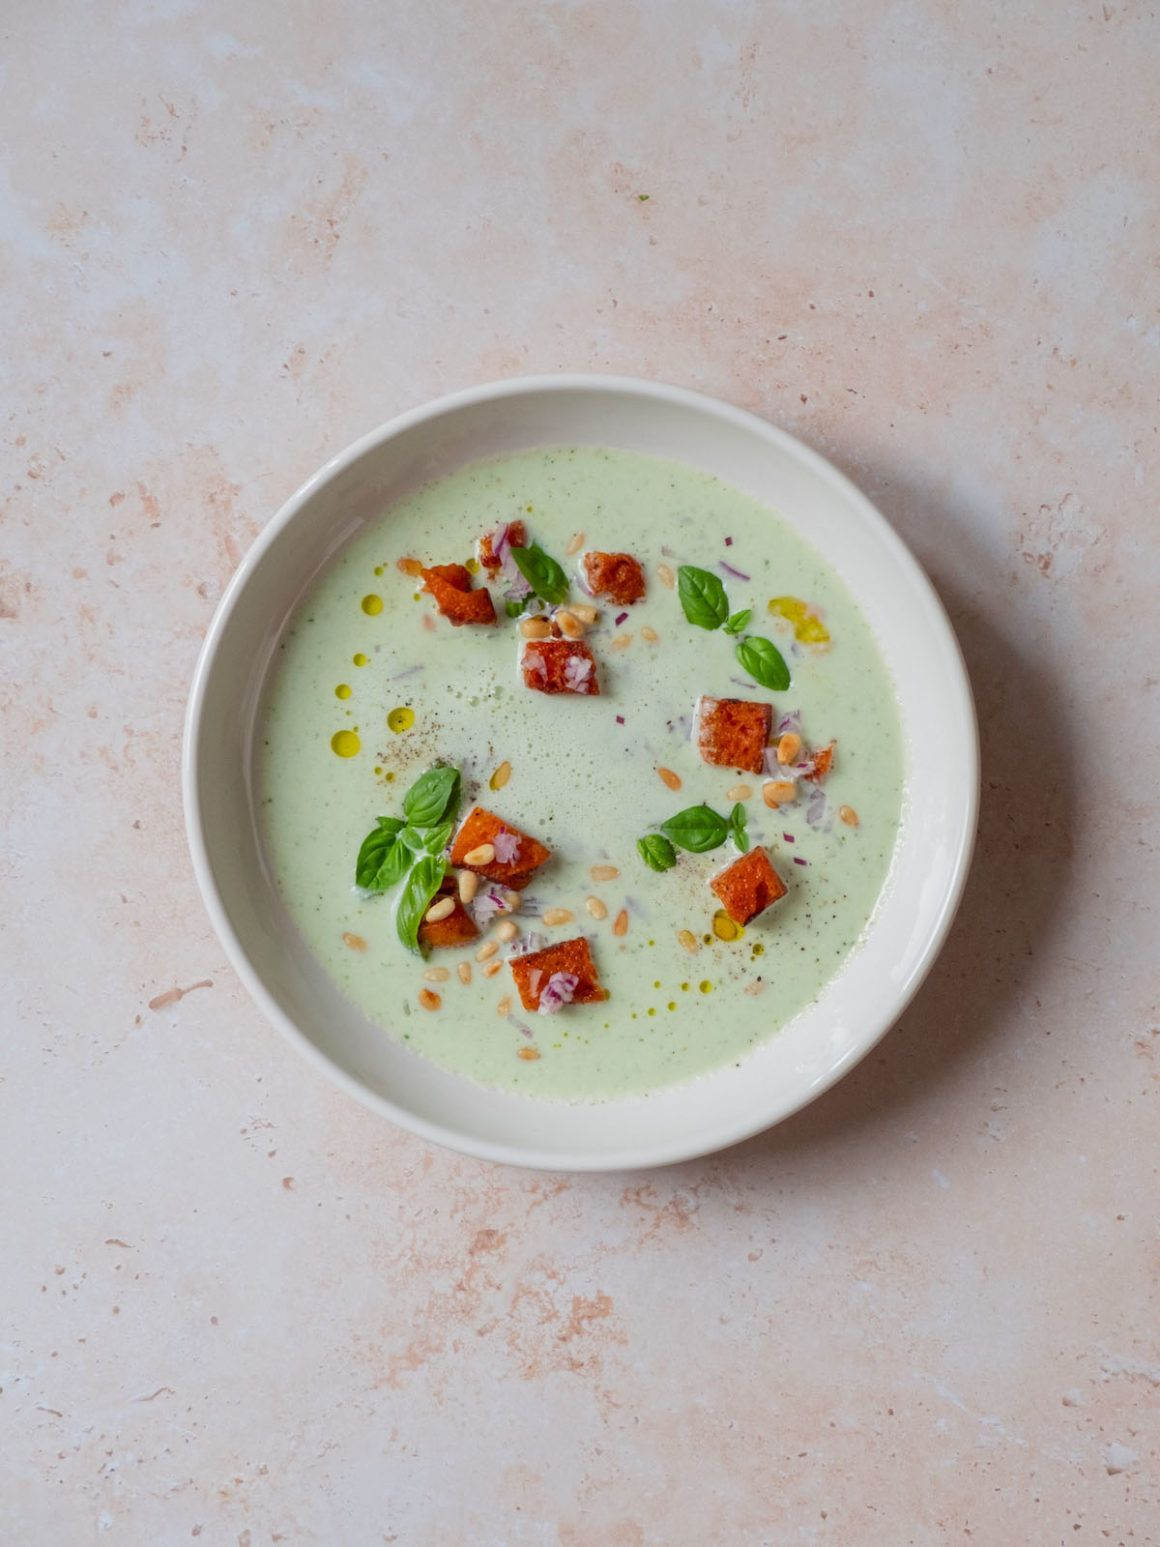 Foodblog, About Fuel, Rezept, Vorspeise, Basilikum, Buttermilch, Tomatencroutons, Pinienkerne